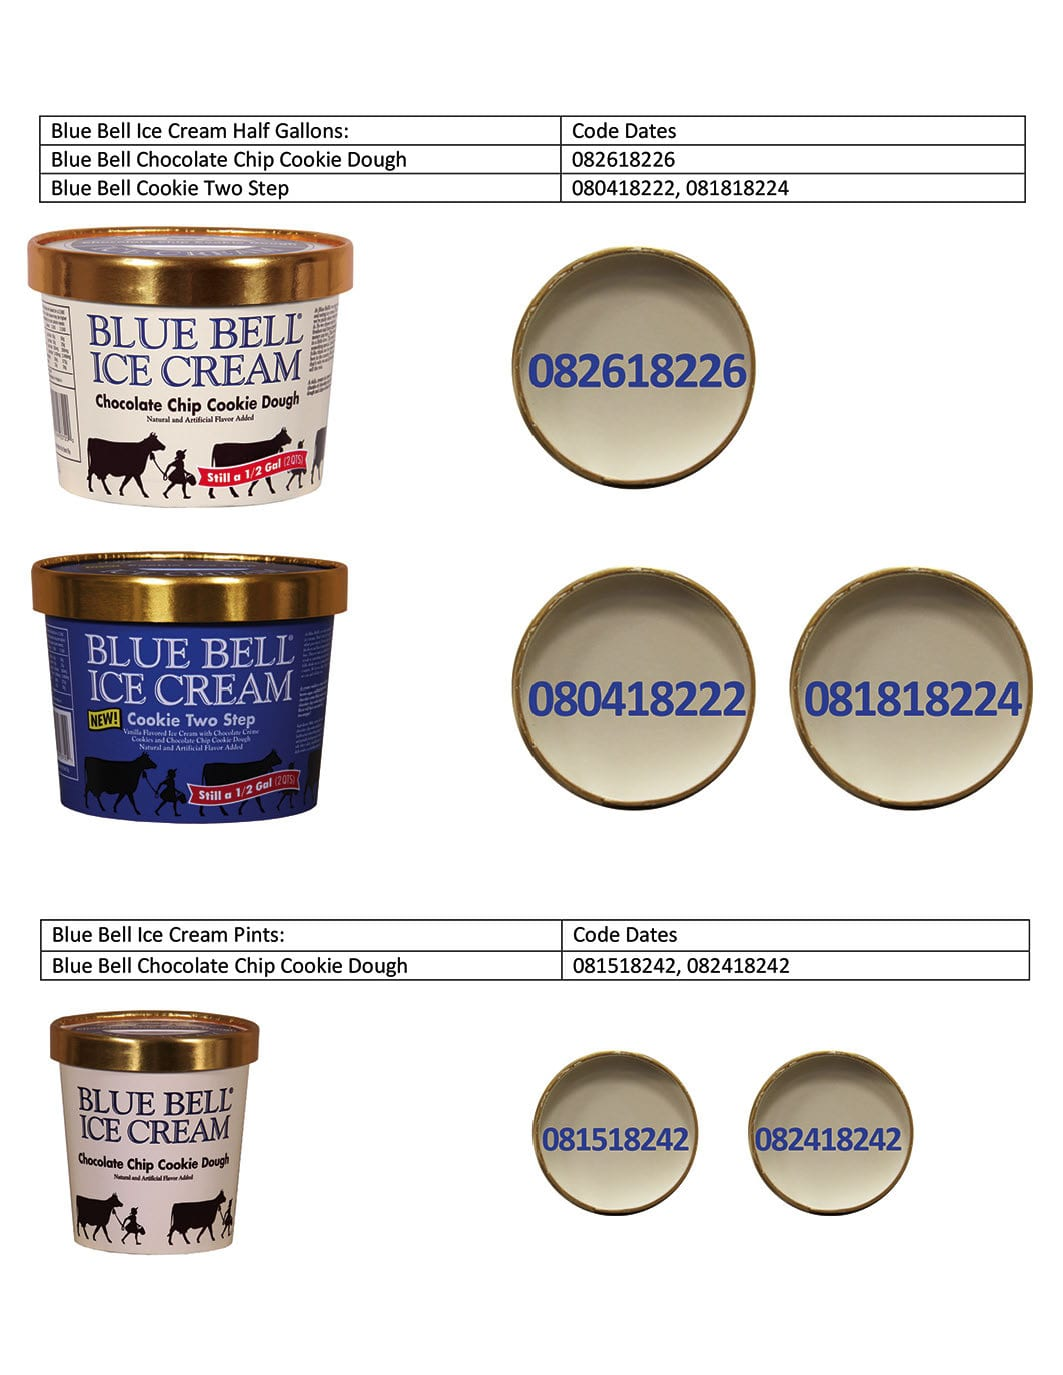 blue bell recalls ice cream 2016 listeria cookie dough supplier